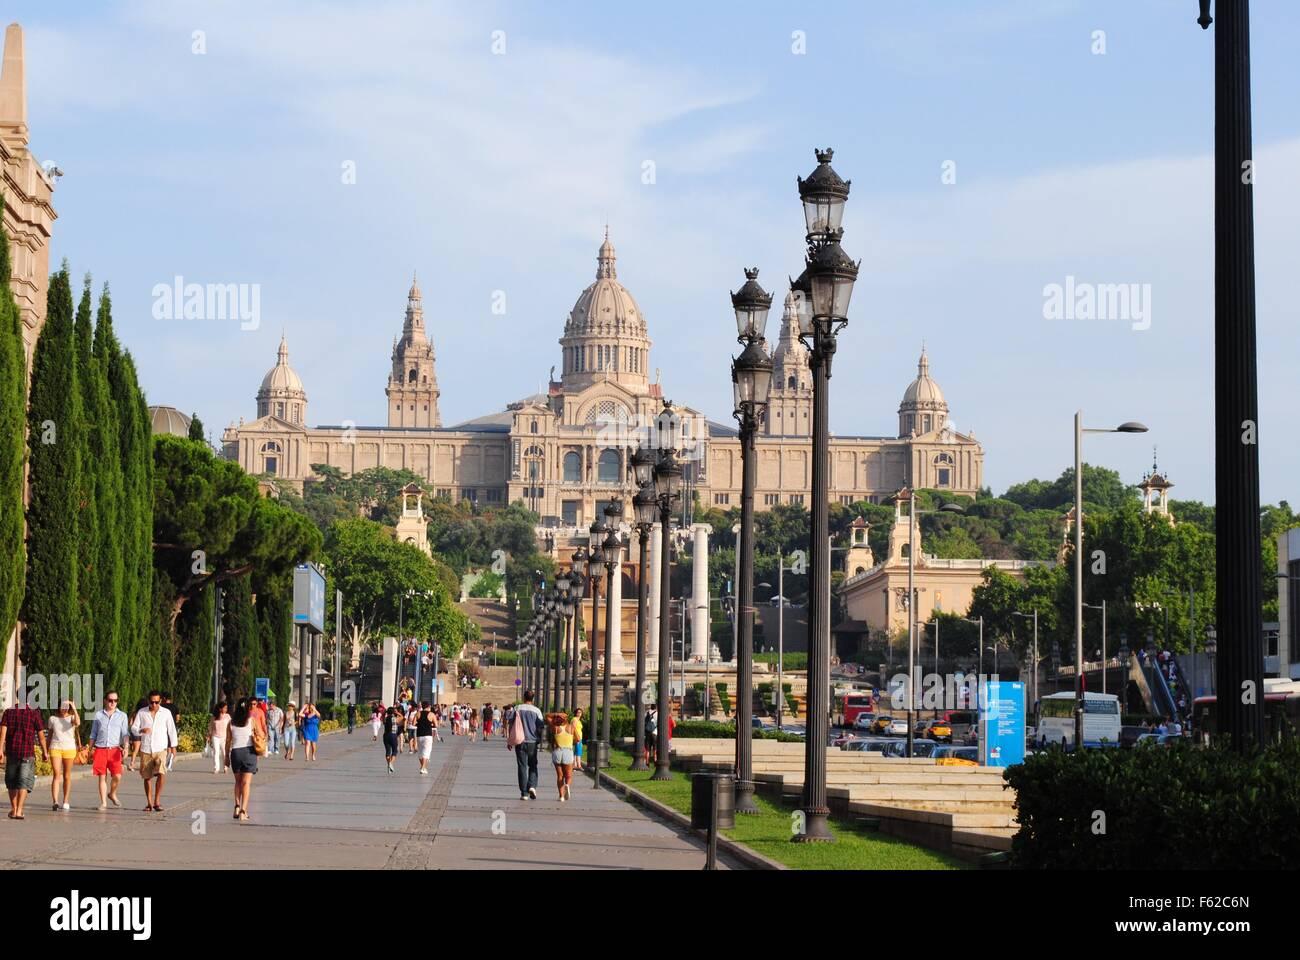 National Museum of Art of Catalunya (MNAC), Barcelona, Spain - Stock Image